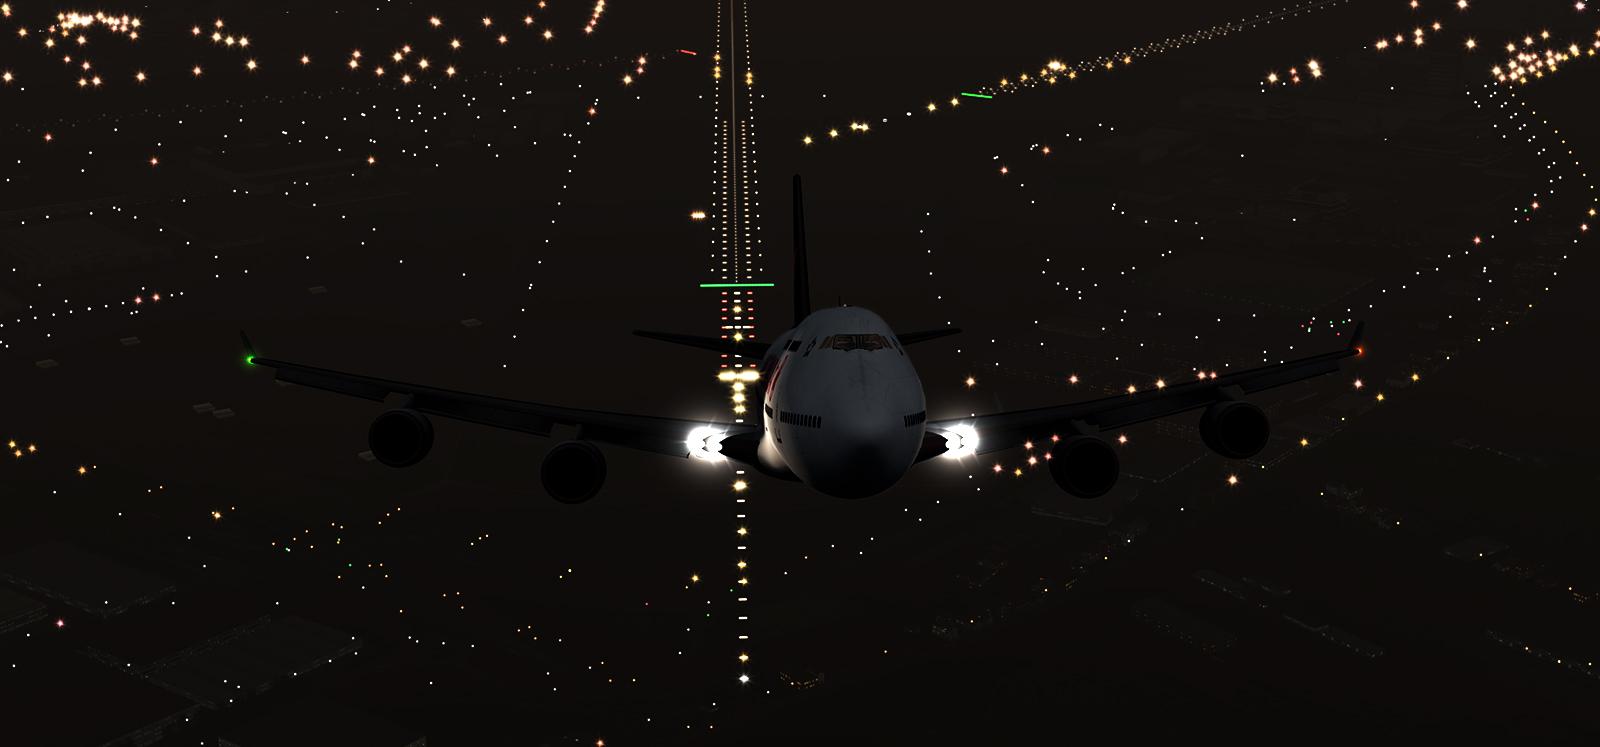 aerofly_fs_2_screenshot_13_20181203-0036